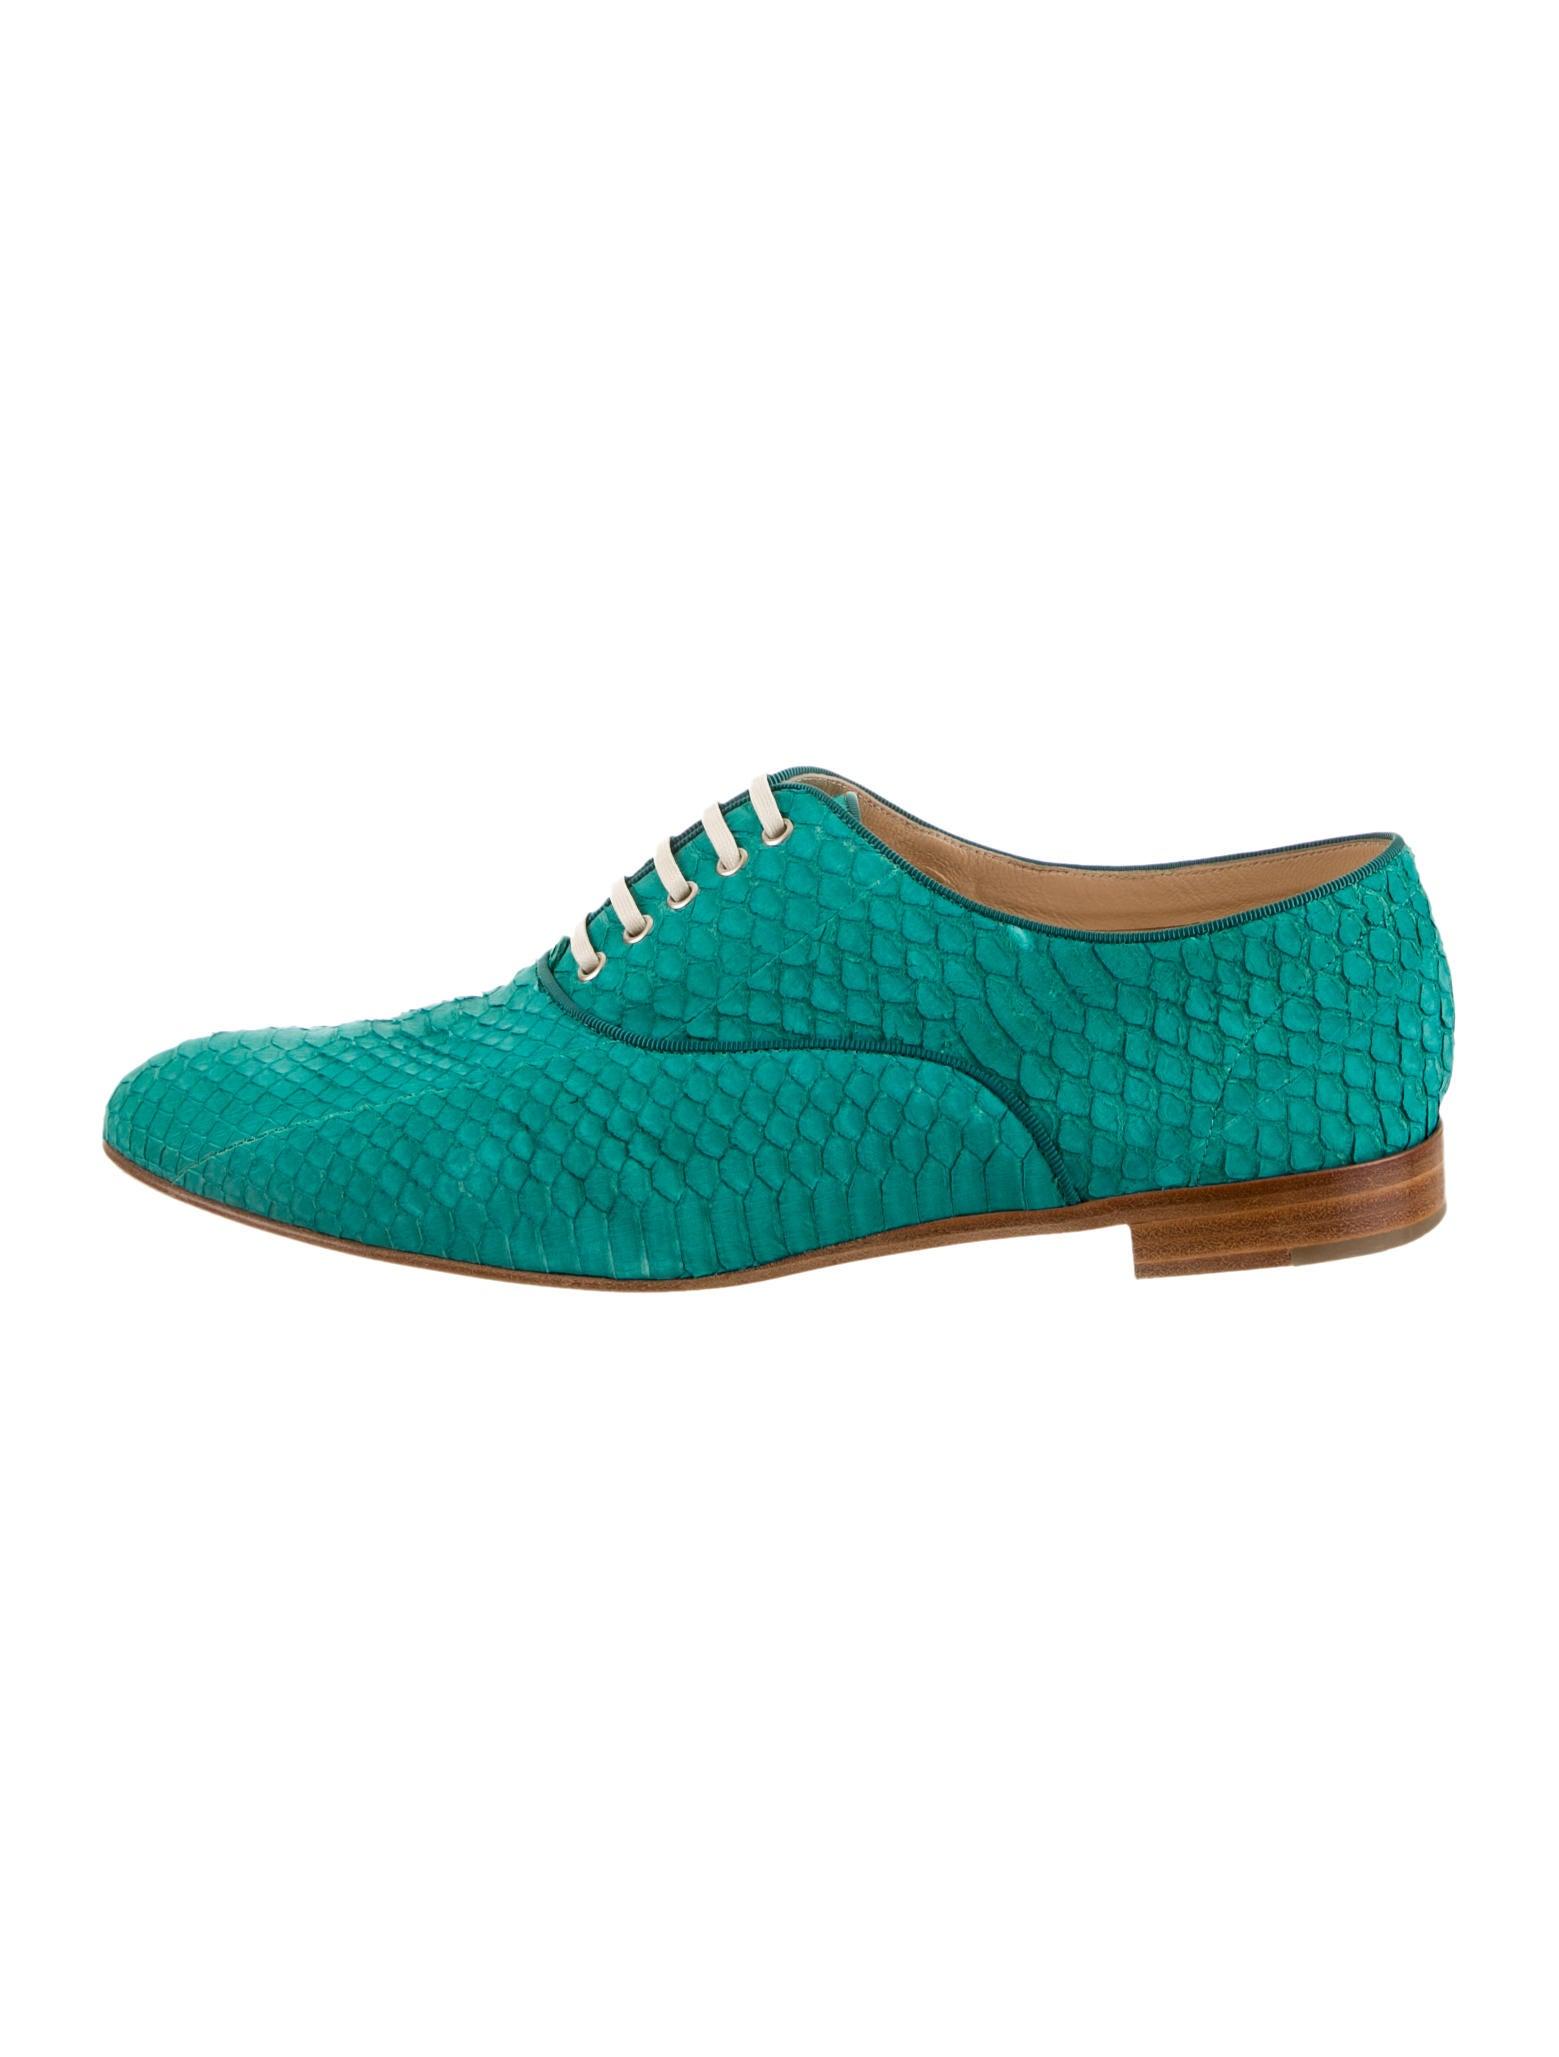 replica louboutin uk - christian louboutin Fred oxfords Jade snakeskin stacked heels ...